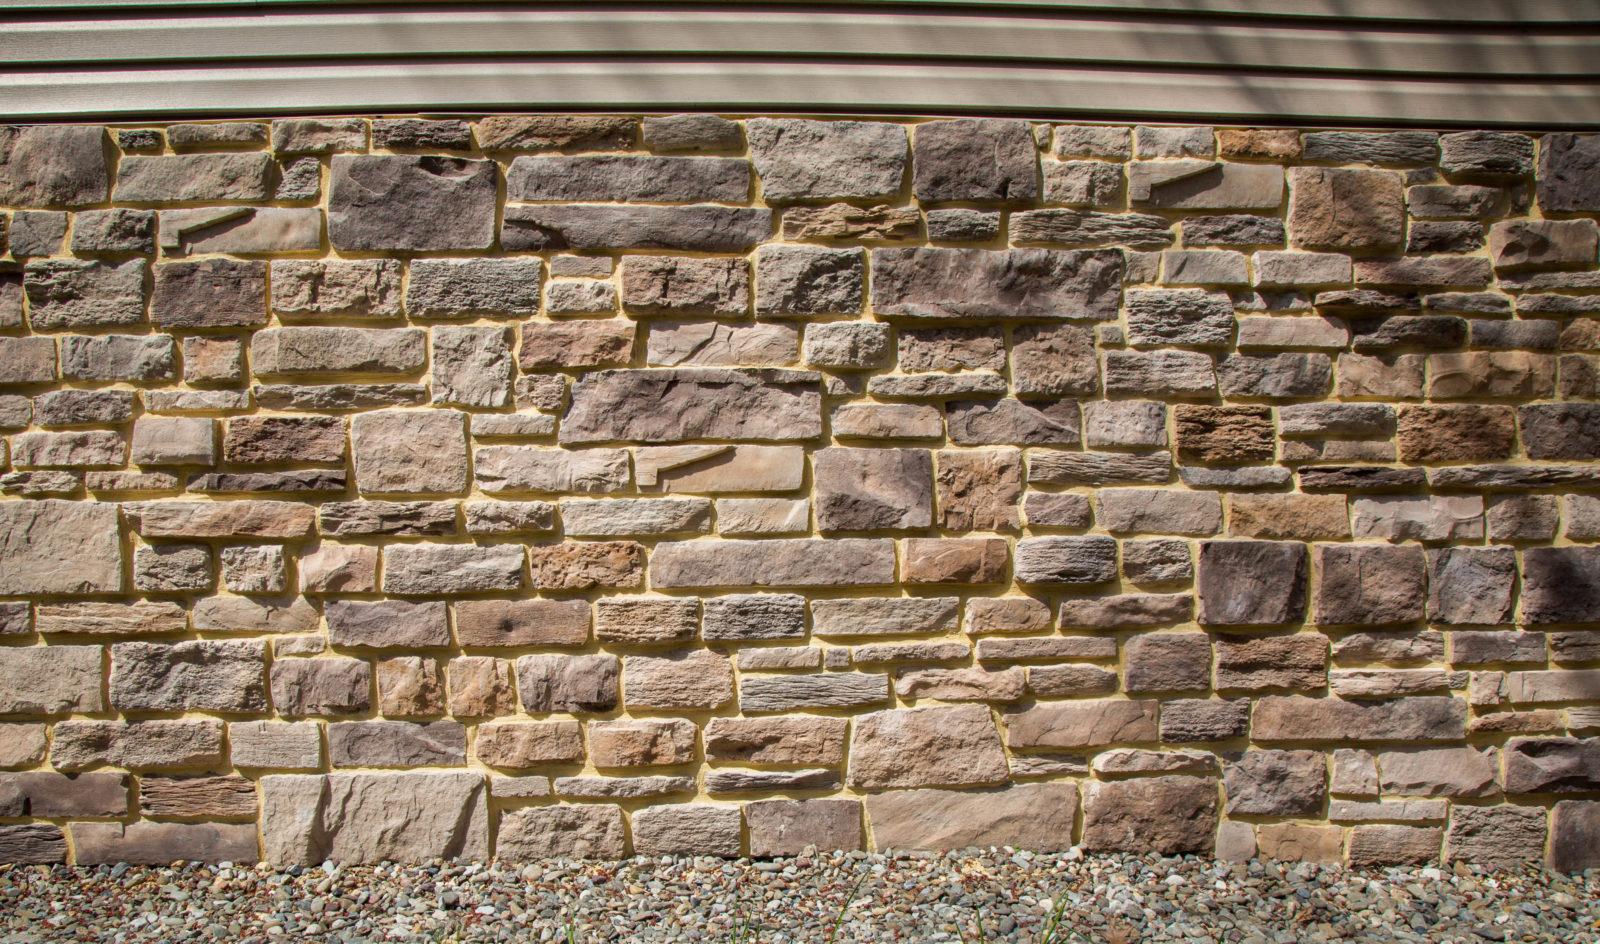 detail of decorative stone siding